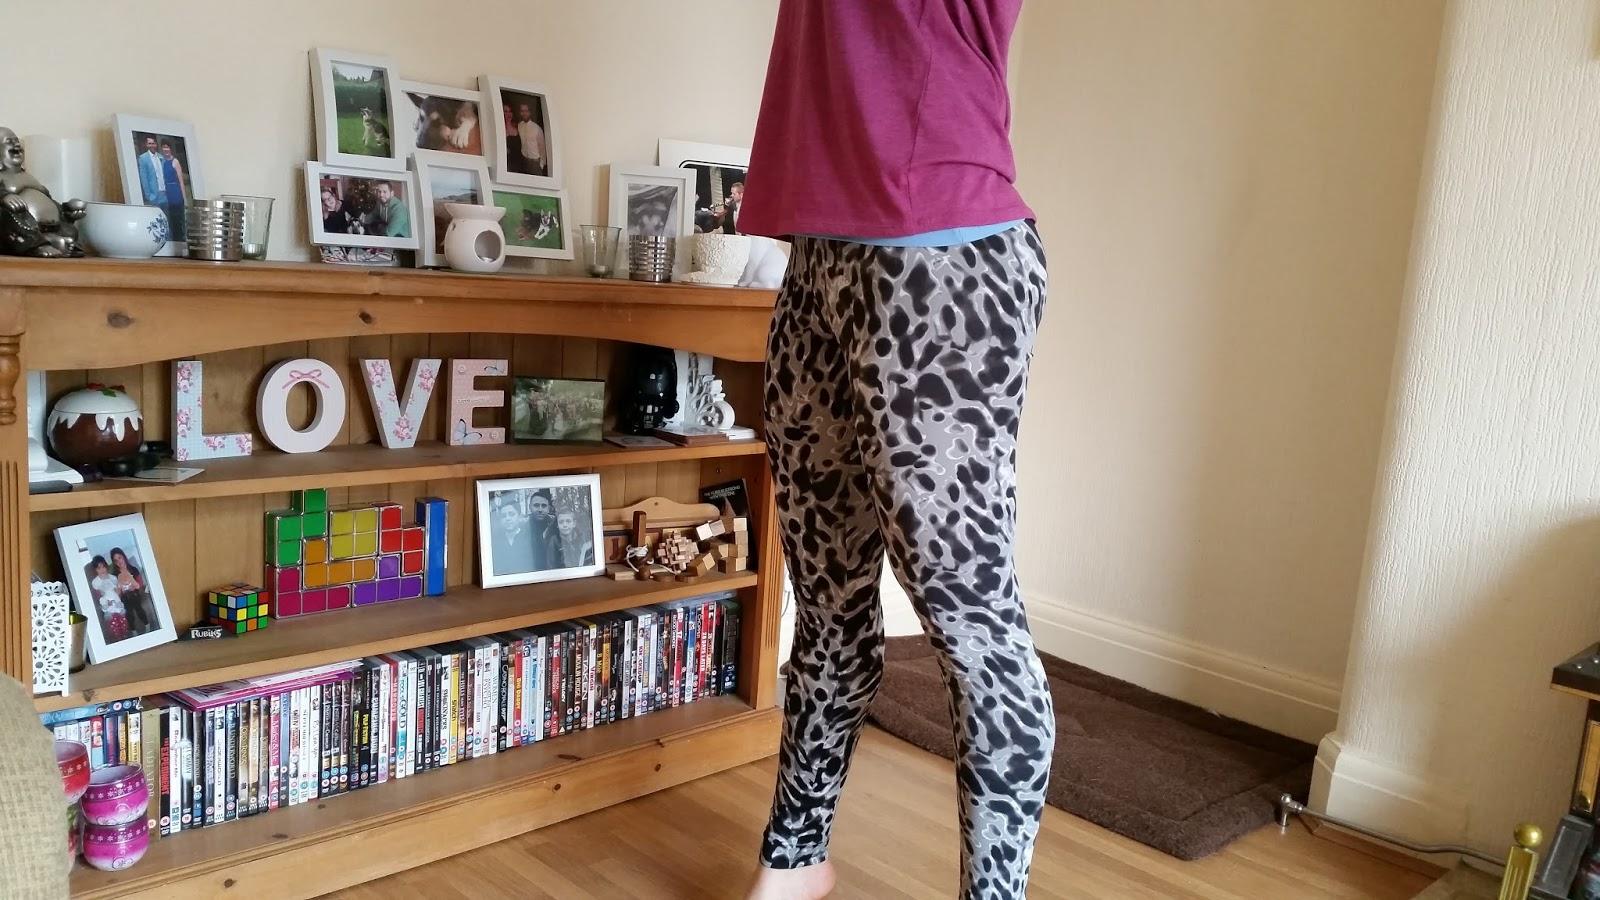 Tesco F&F Animal Print Leggings - My General Life